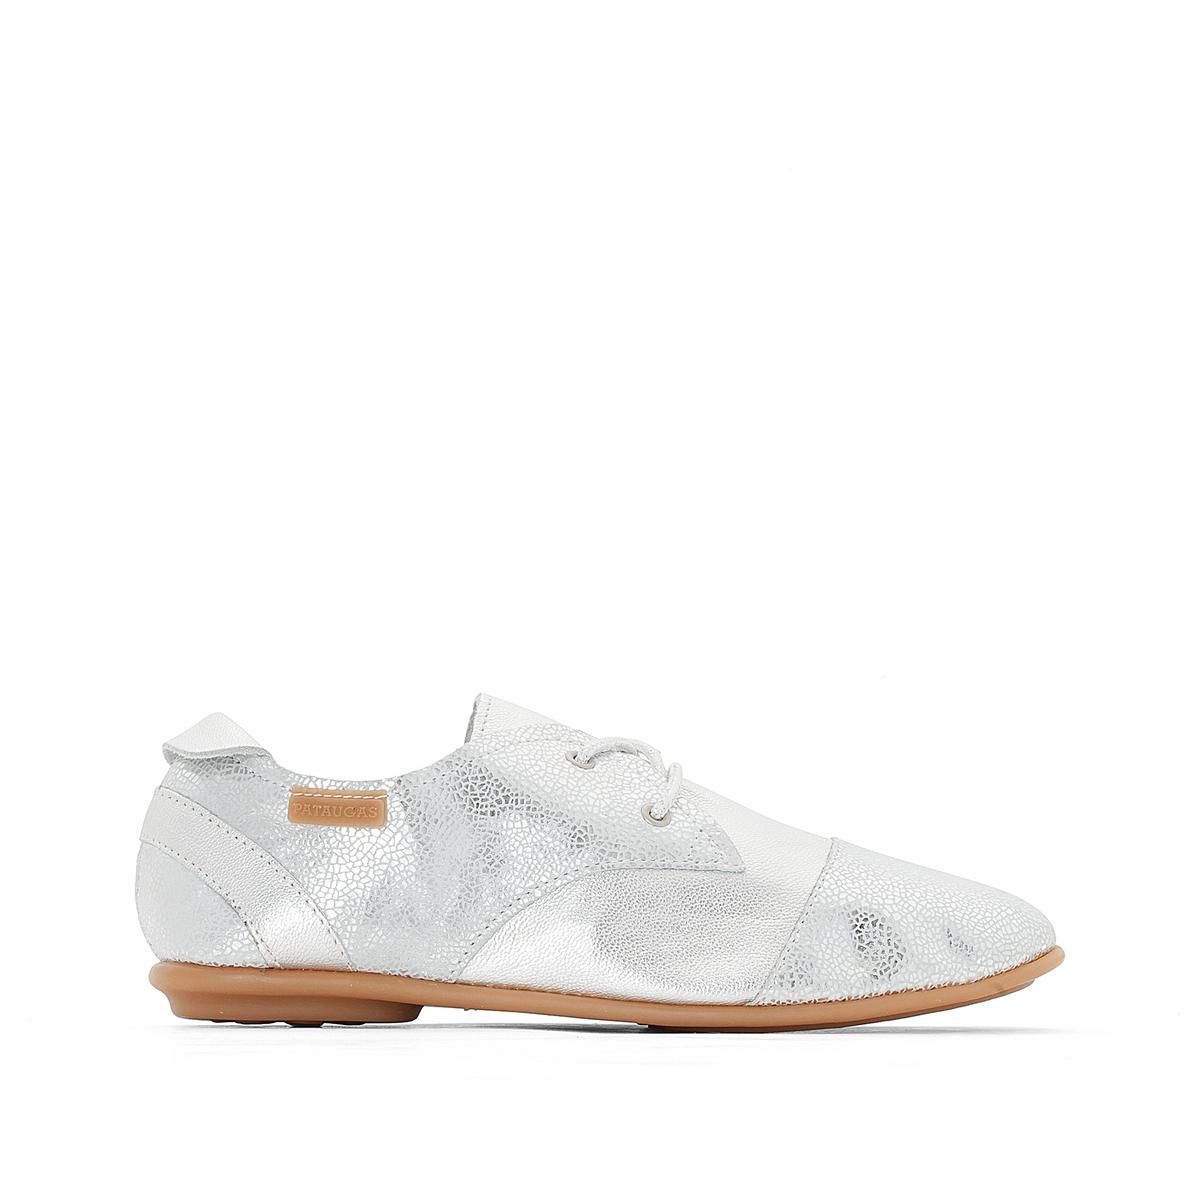 Ботинки-дерби кожаные  Swing/S